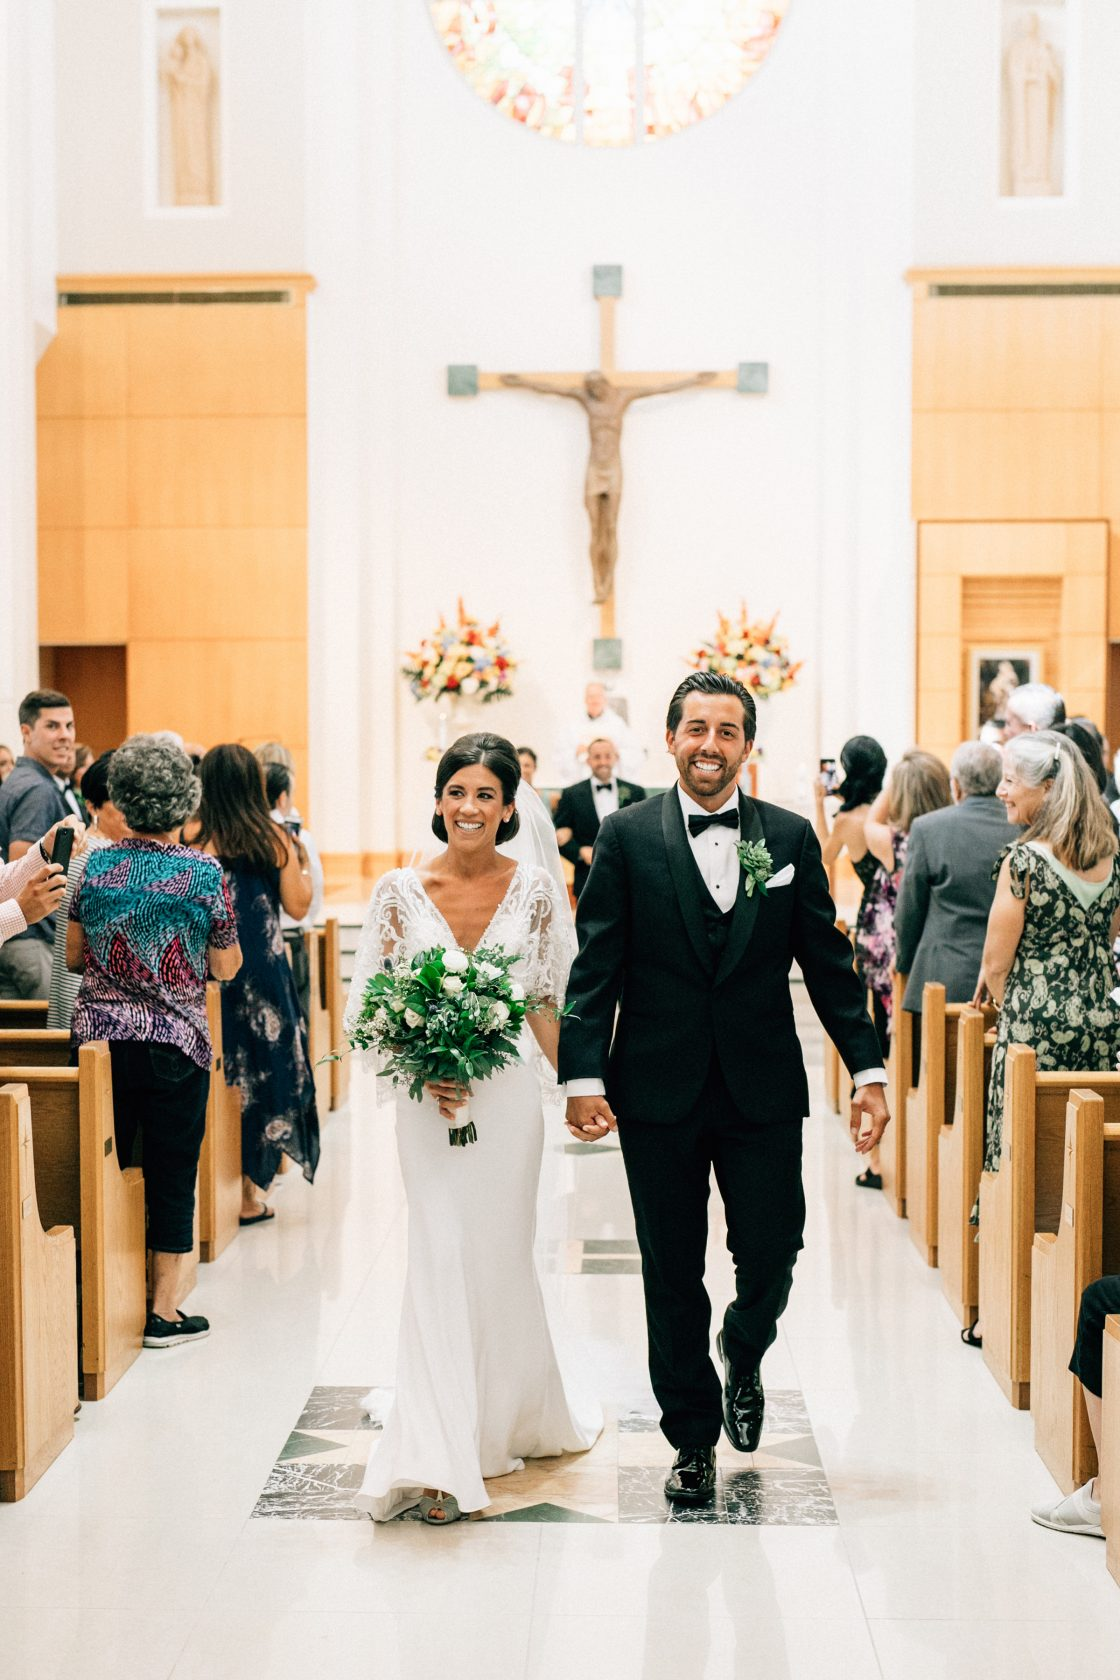 Elegant New Jersey Wedding with Greenery 34